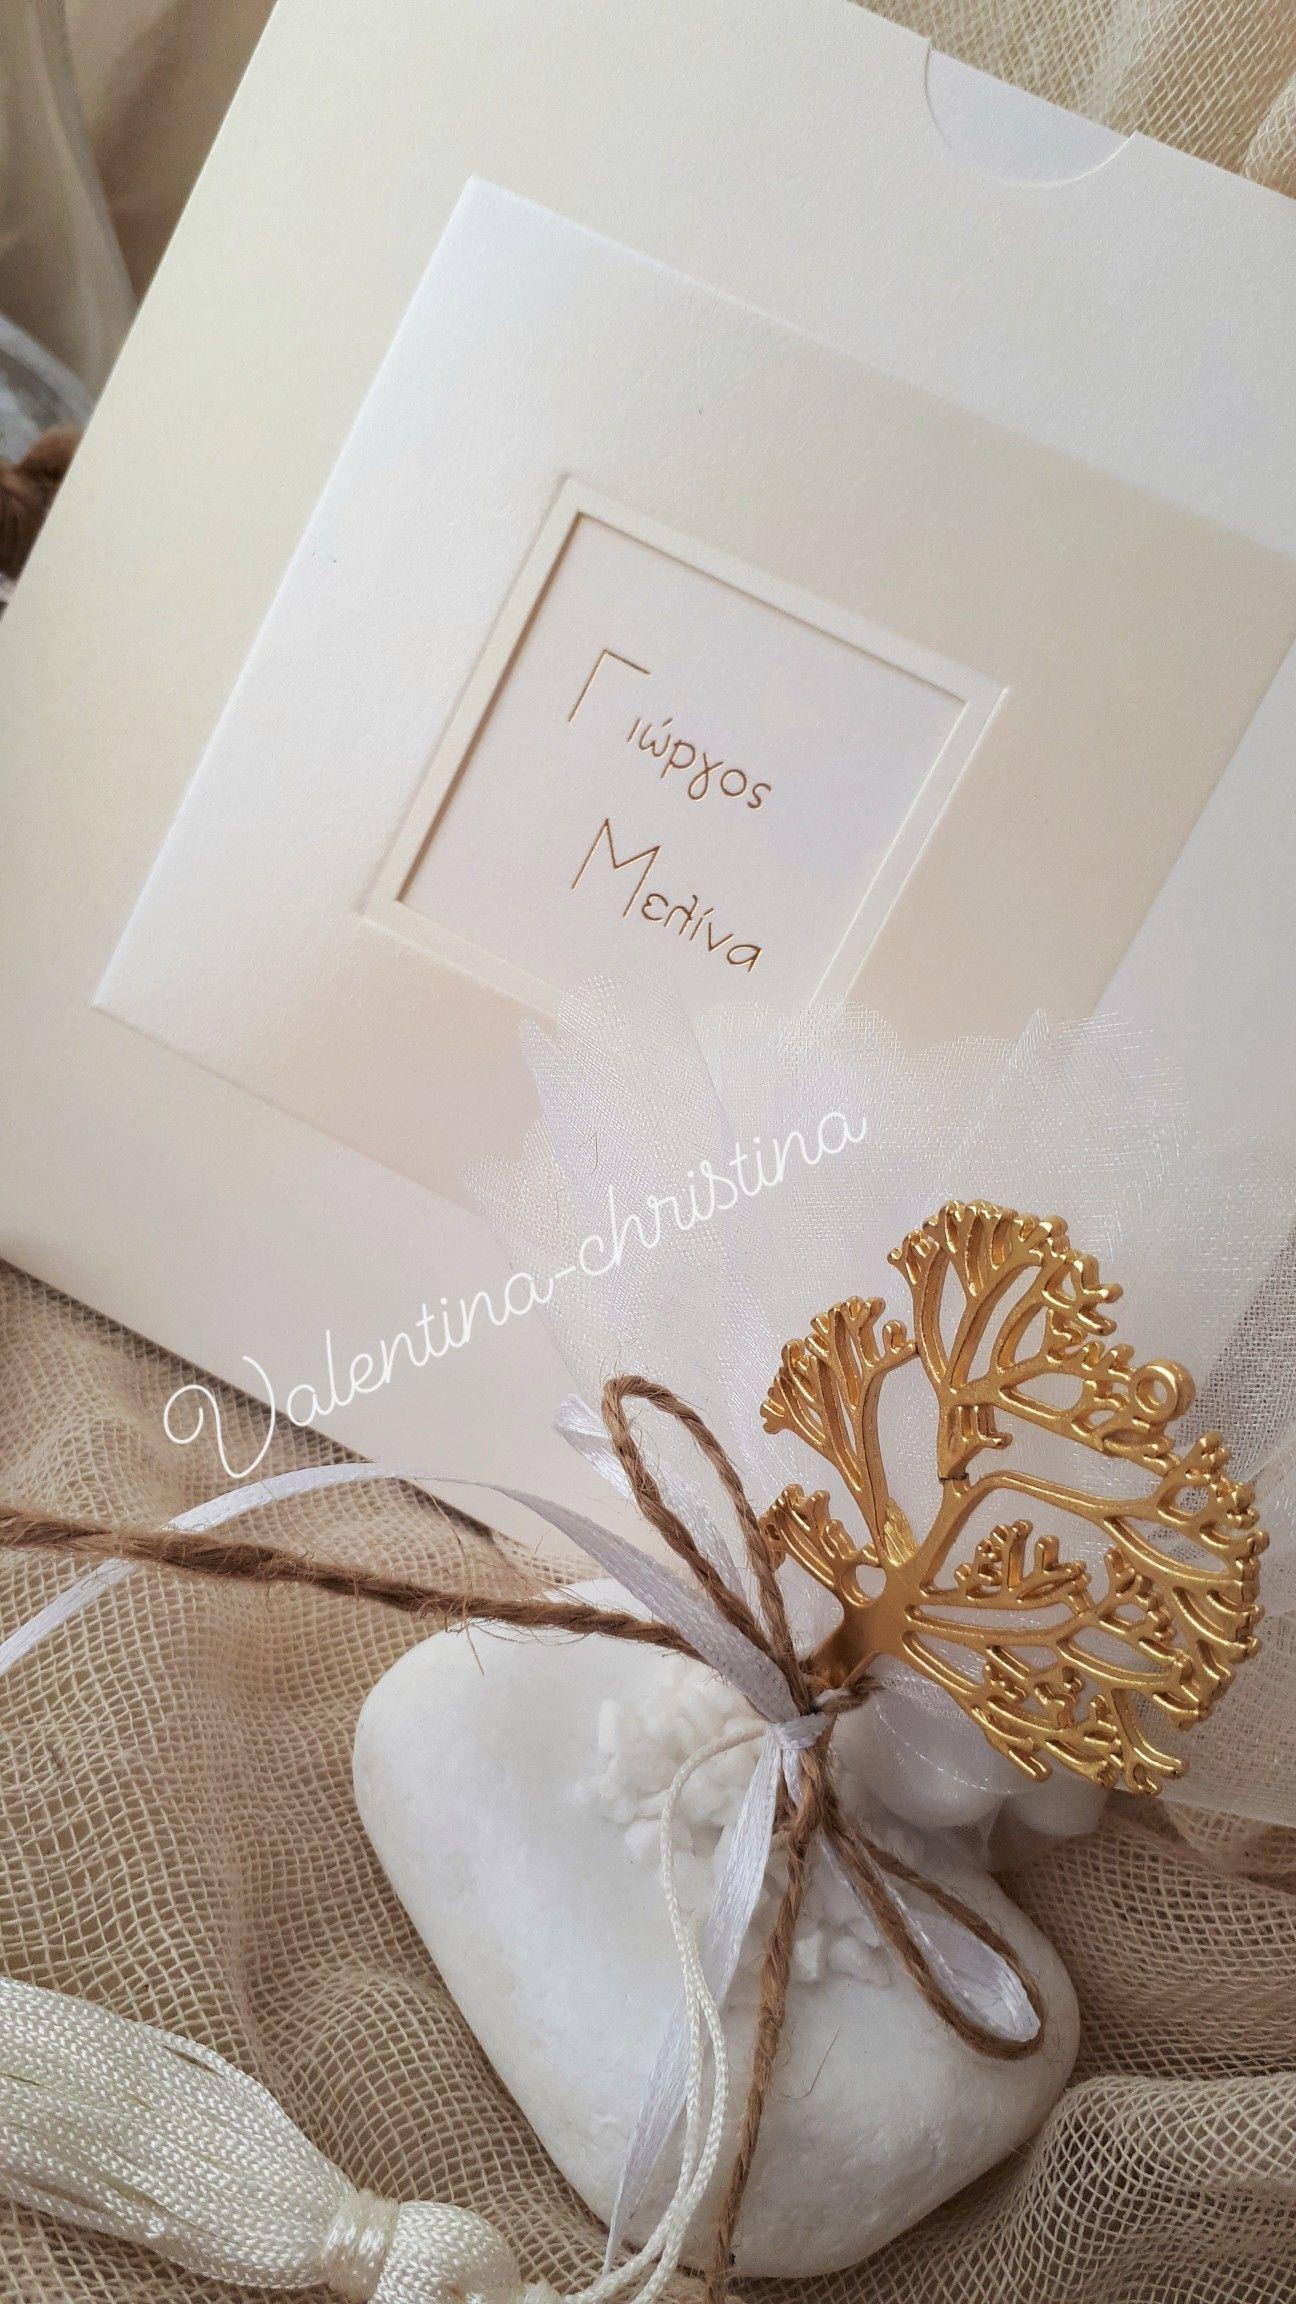 ee2b56da3e39 Μοναδικά προσκλητήρια από φίνα υλικά σετ με μπομπονιέρες γάμου μεταλλικό  δέντρο βότσαλο καλέστε 2105157506 Ιδιαίτερα προσκλητήρια